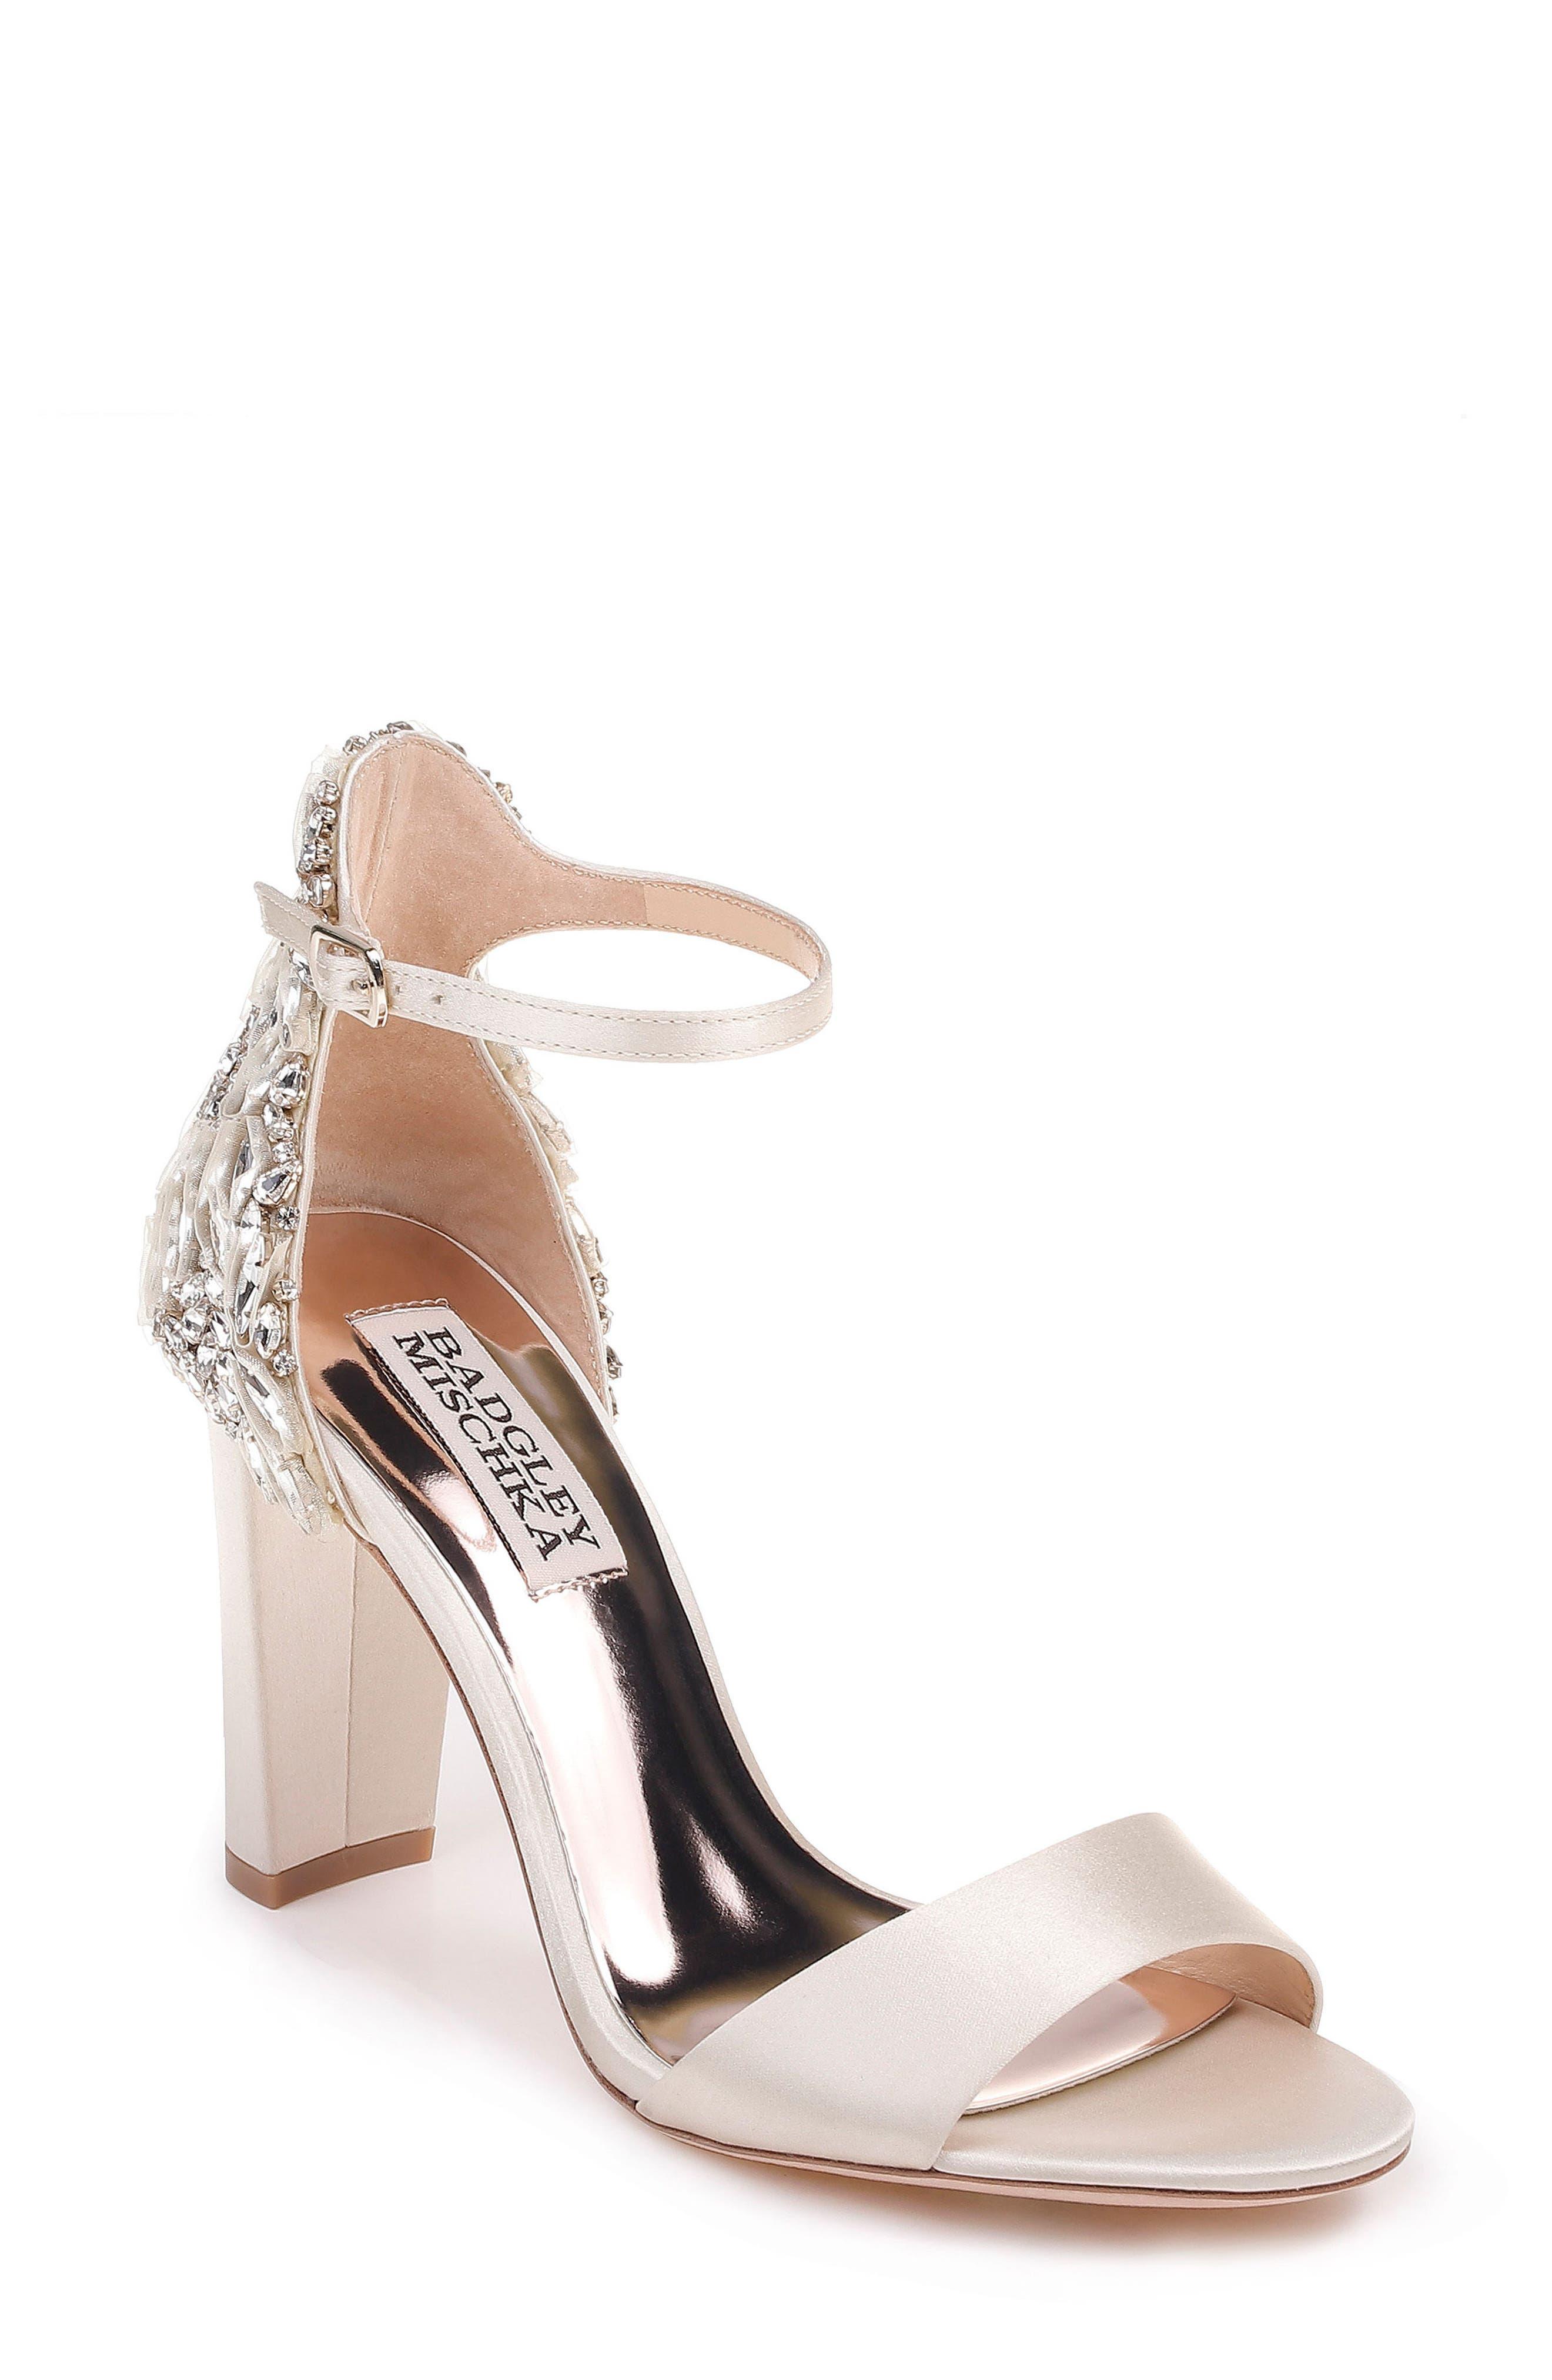 Seina Ankle Strap Sandal,                         Main,                         color, 100